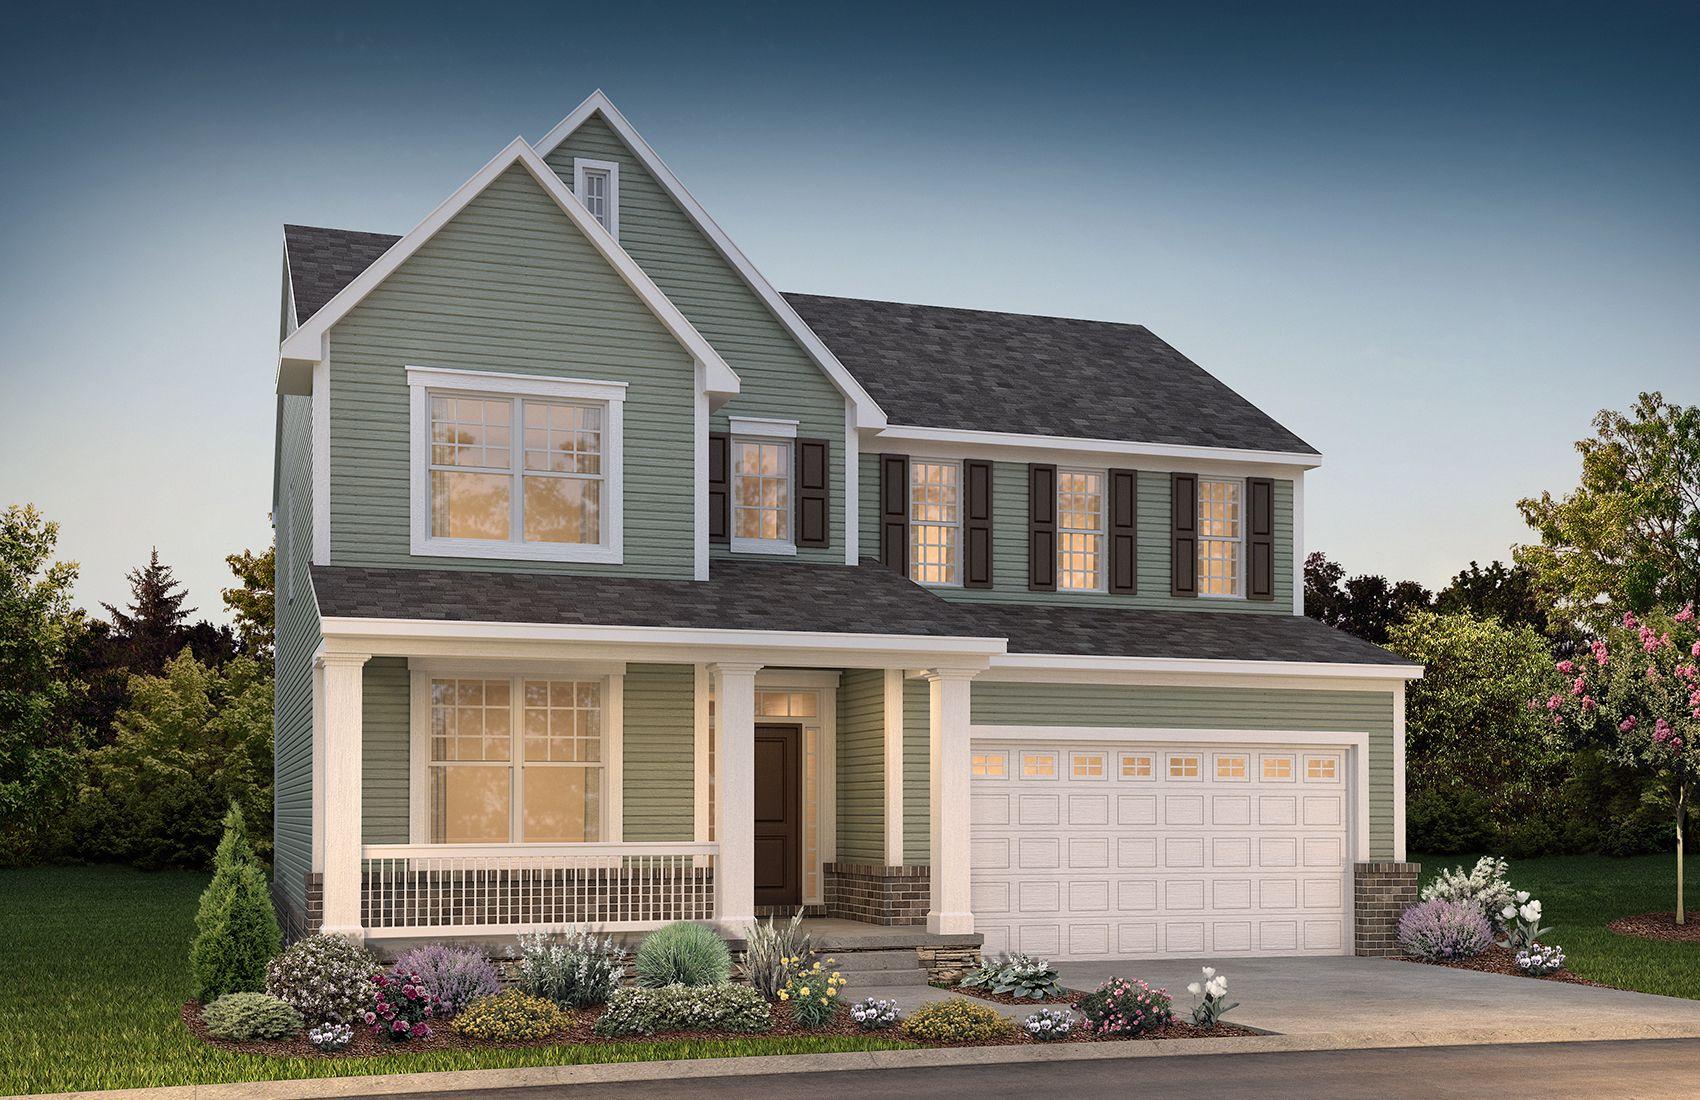 Exterior of a New Home in Novi MI:Yorktown Exterior